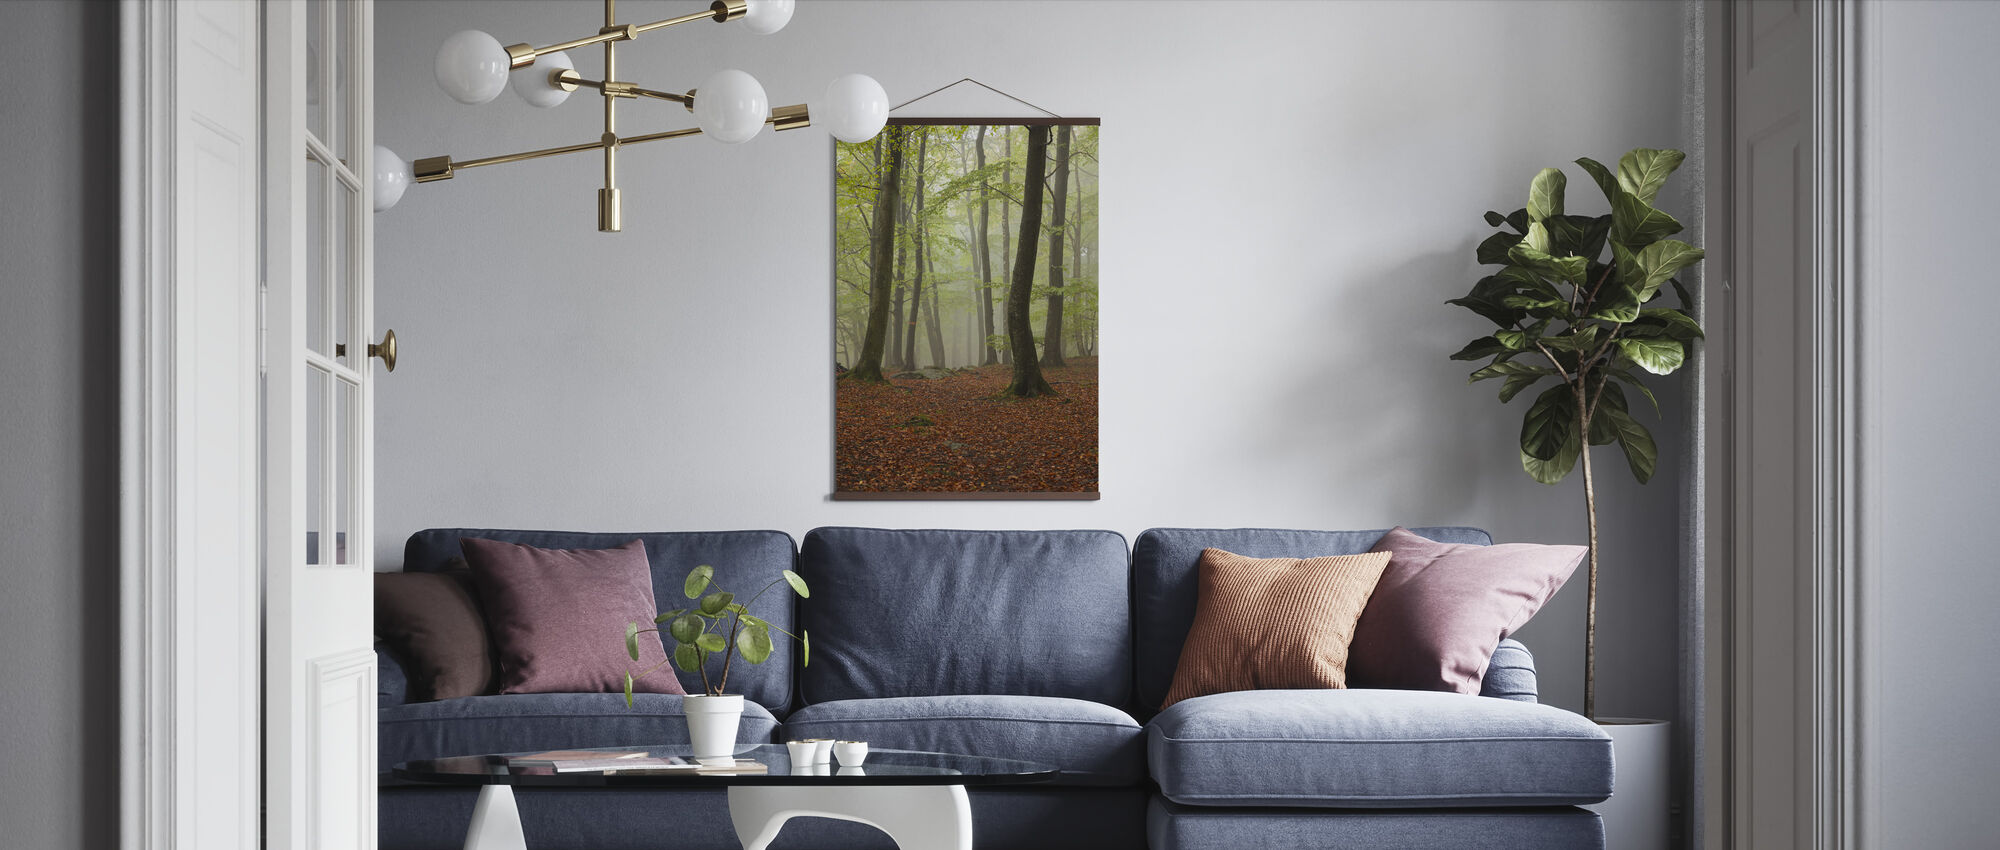 Clowing Hallar Beech Forest, Sweden, Europe - Poster - Living Room